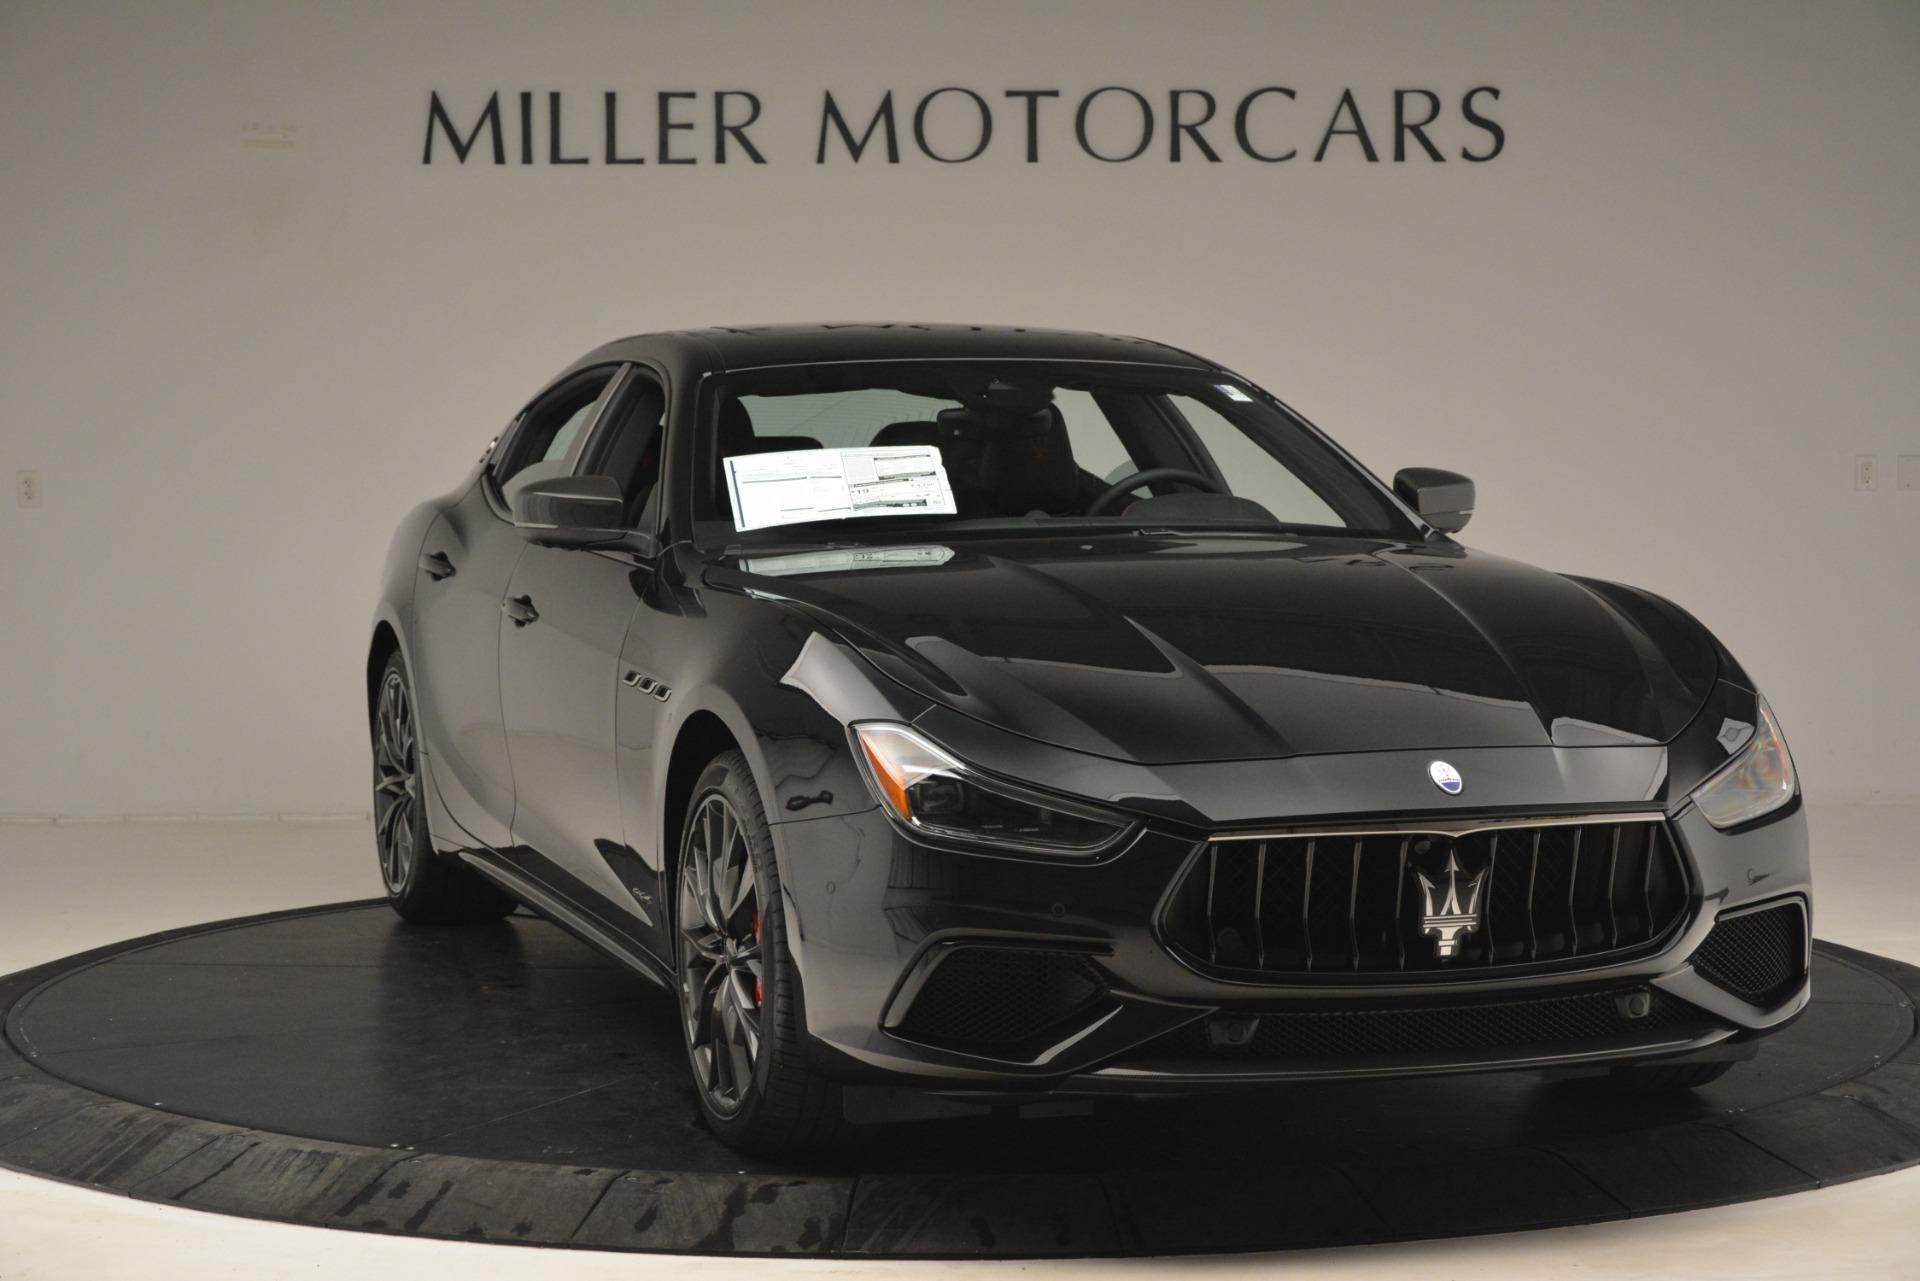 New 2019 Maserati Ghibli S Q4 GranSport For Sale In Westport, CT 2926_p11